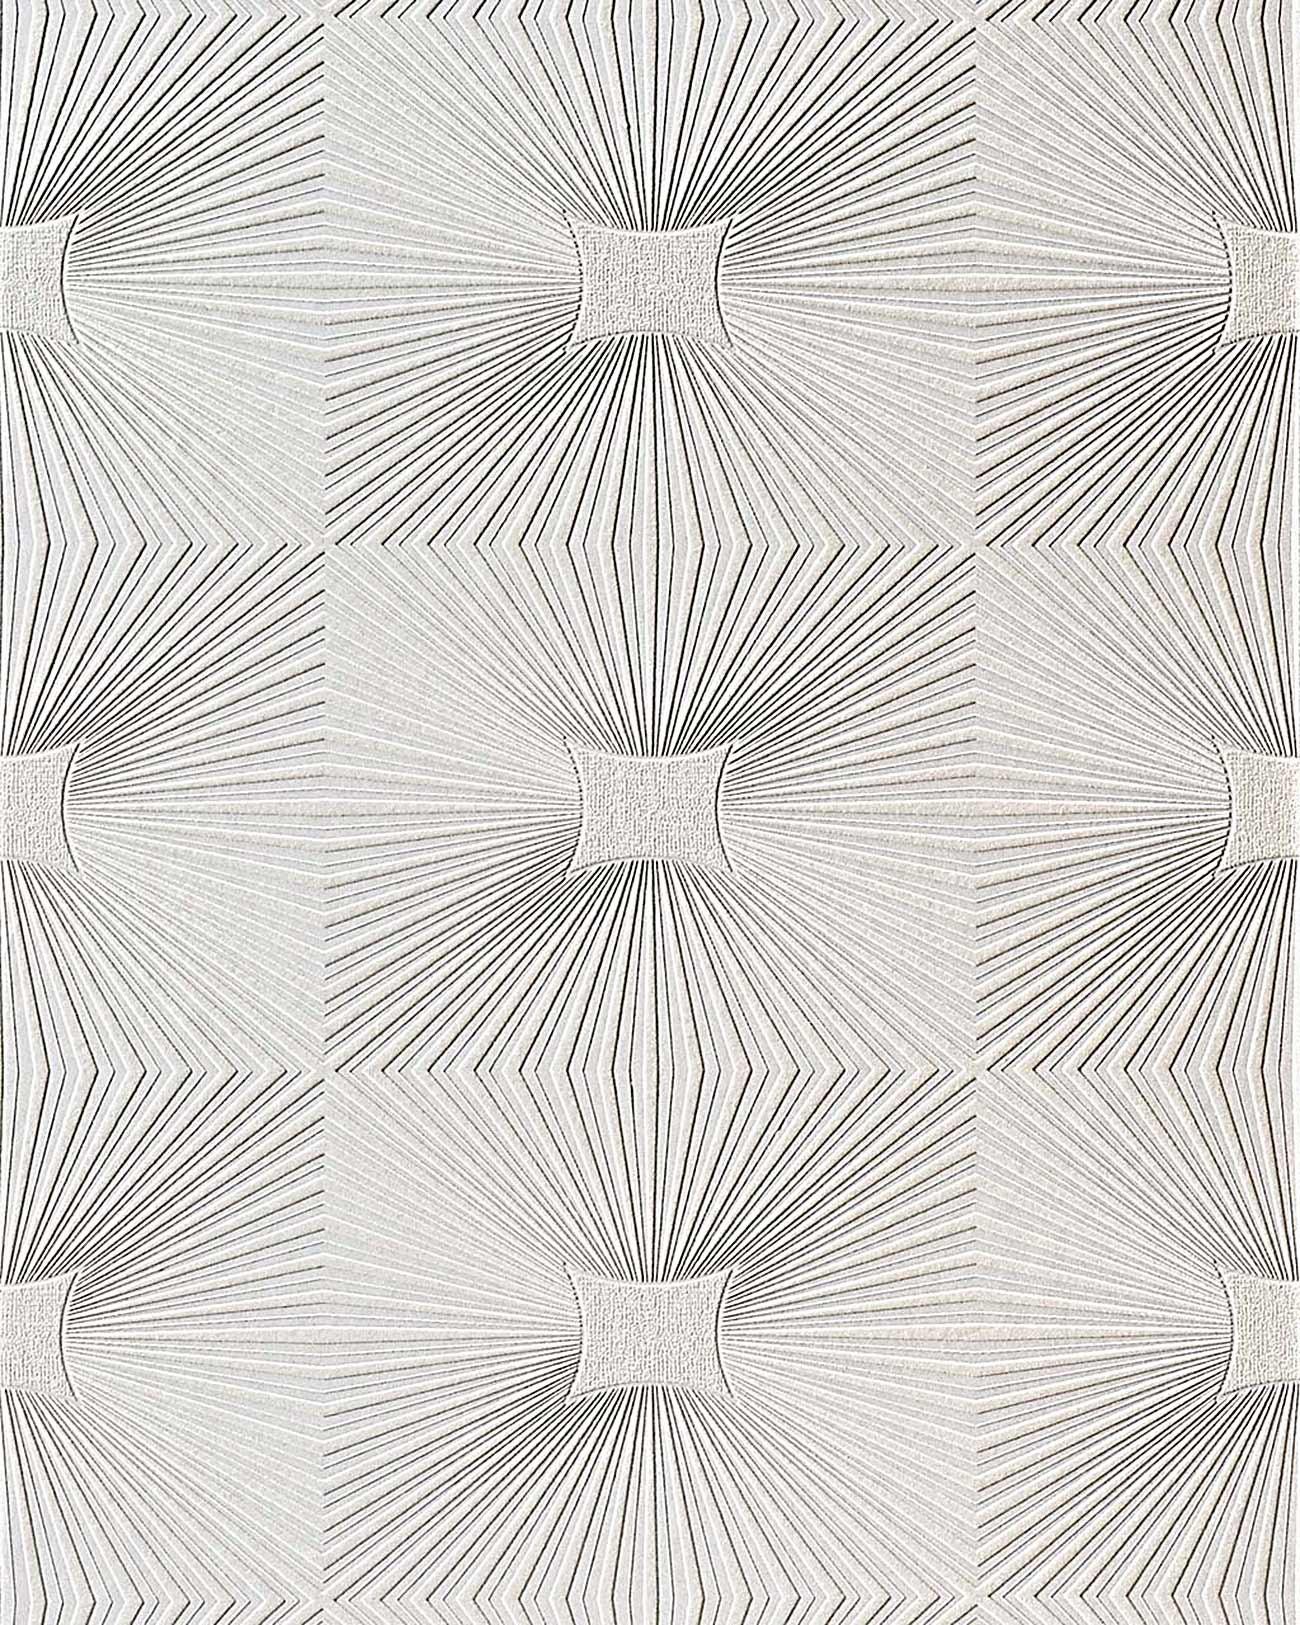 Wit behang reli f behang edem 115 00 voor muur en plafond for Papel pintado para paredes 3d